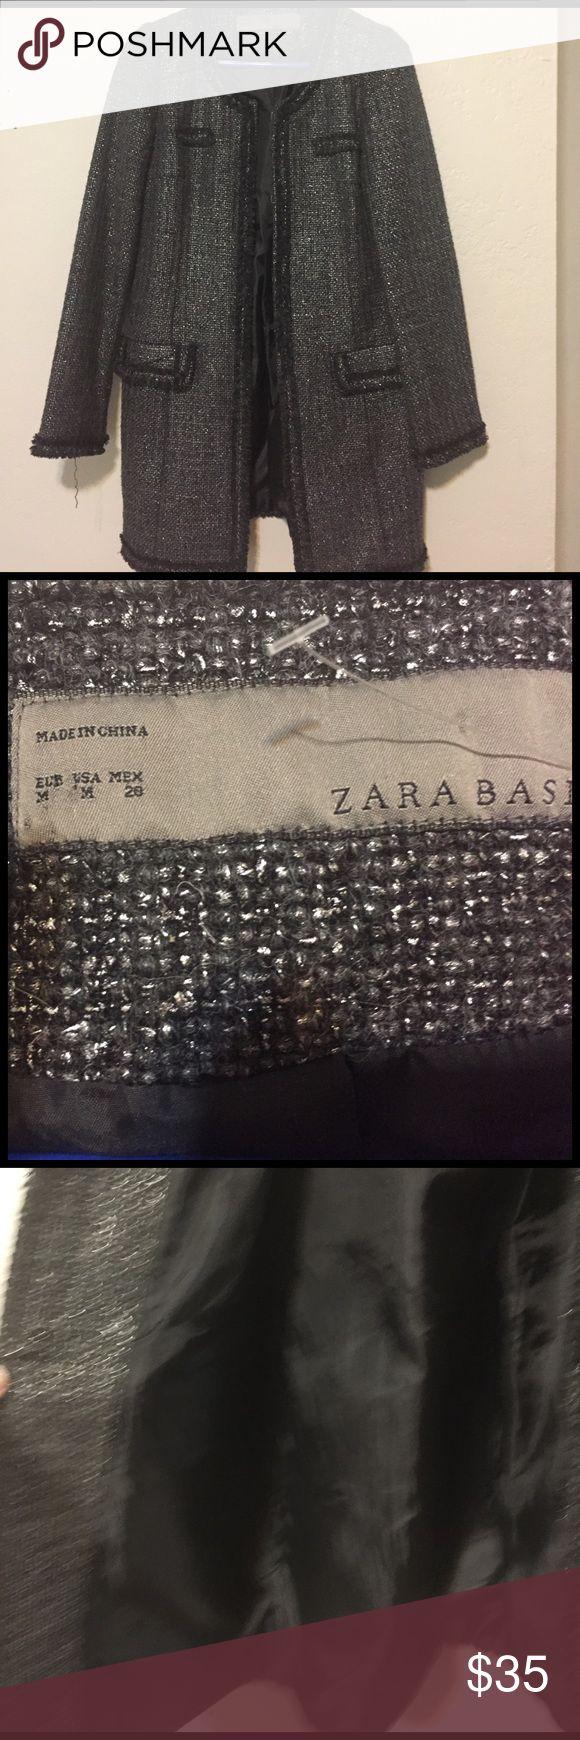 Zara dressy jacket medium Beautiful fully lined Zara longer length dressy jacket- medium weight. Black with silver threading - two front pockets. Cute detailing around hem and edges. Inner hook closures. Zara Jackets & Coats